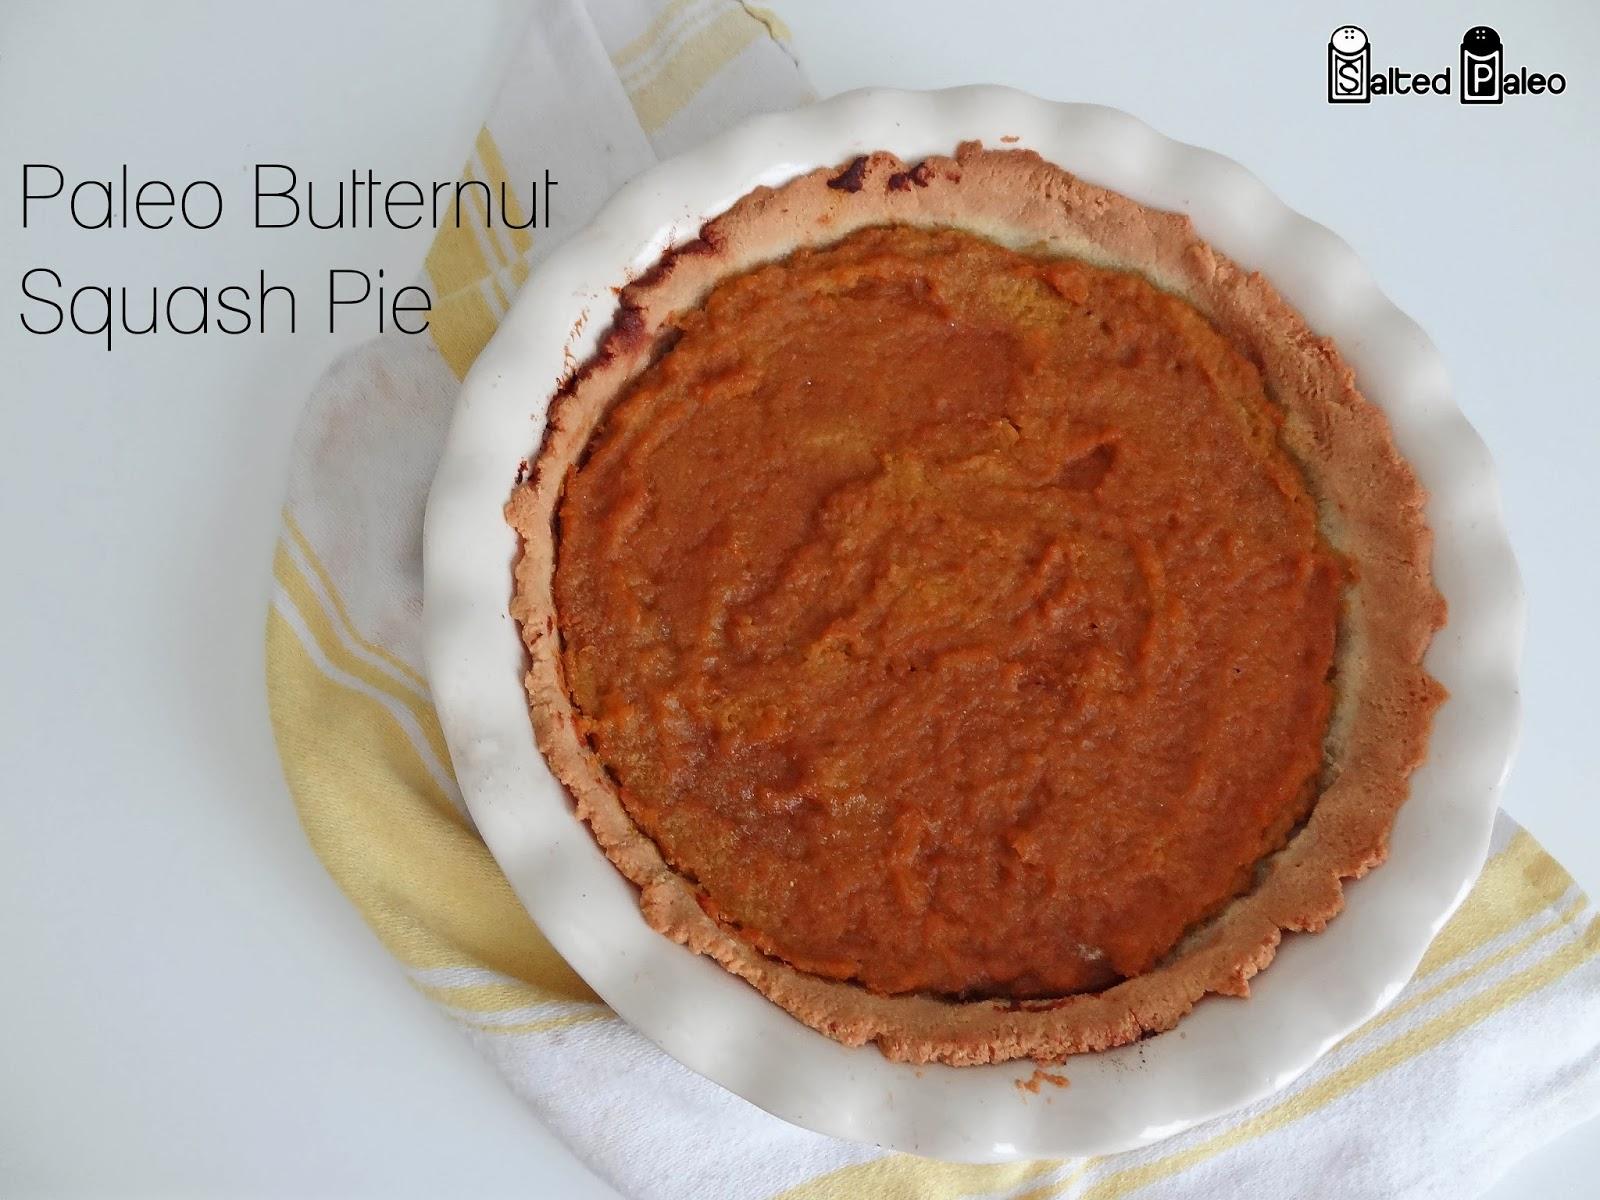 Salted Paleo: Paleo Butternut Squash Pie (scd, paleo)